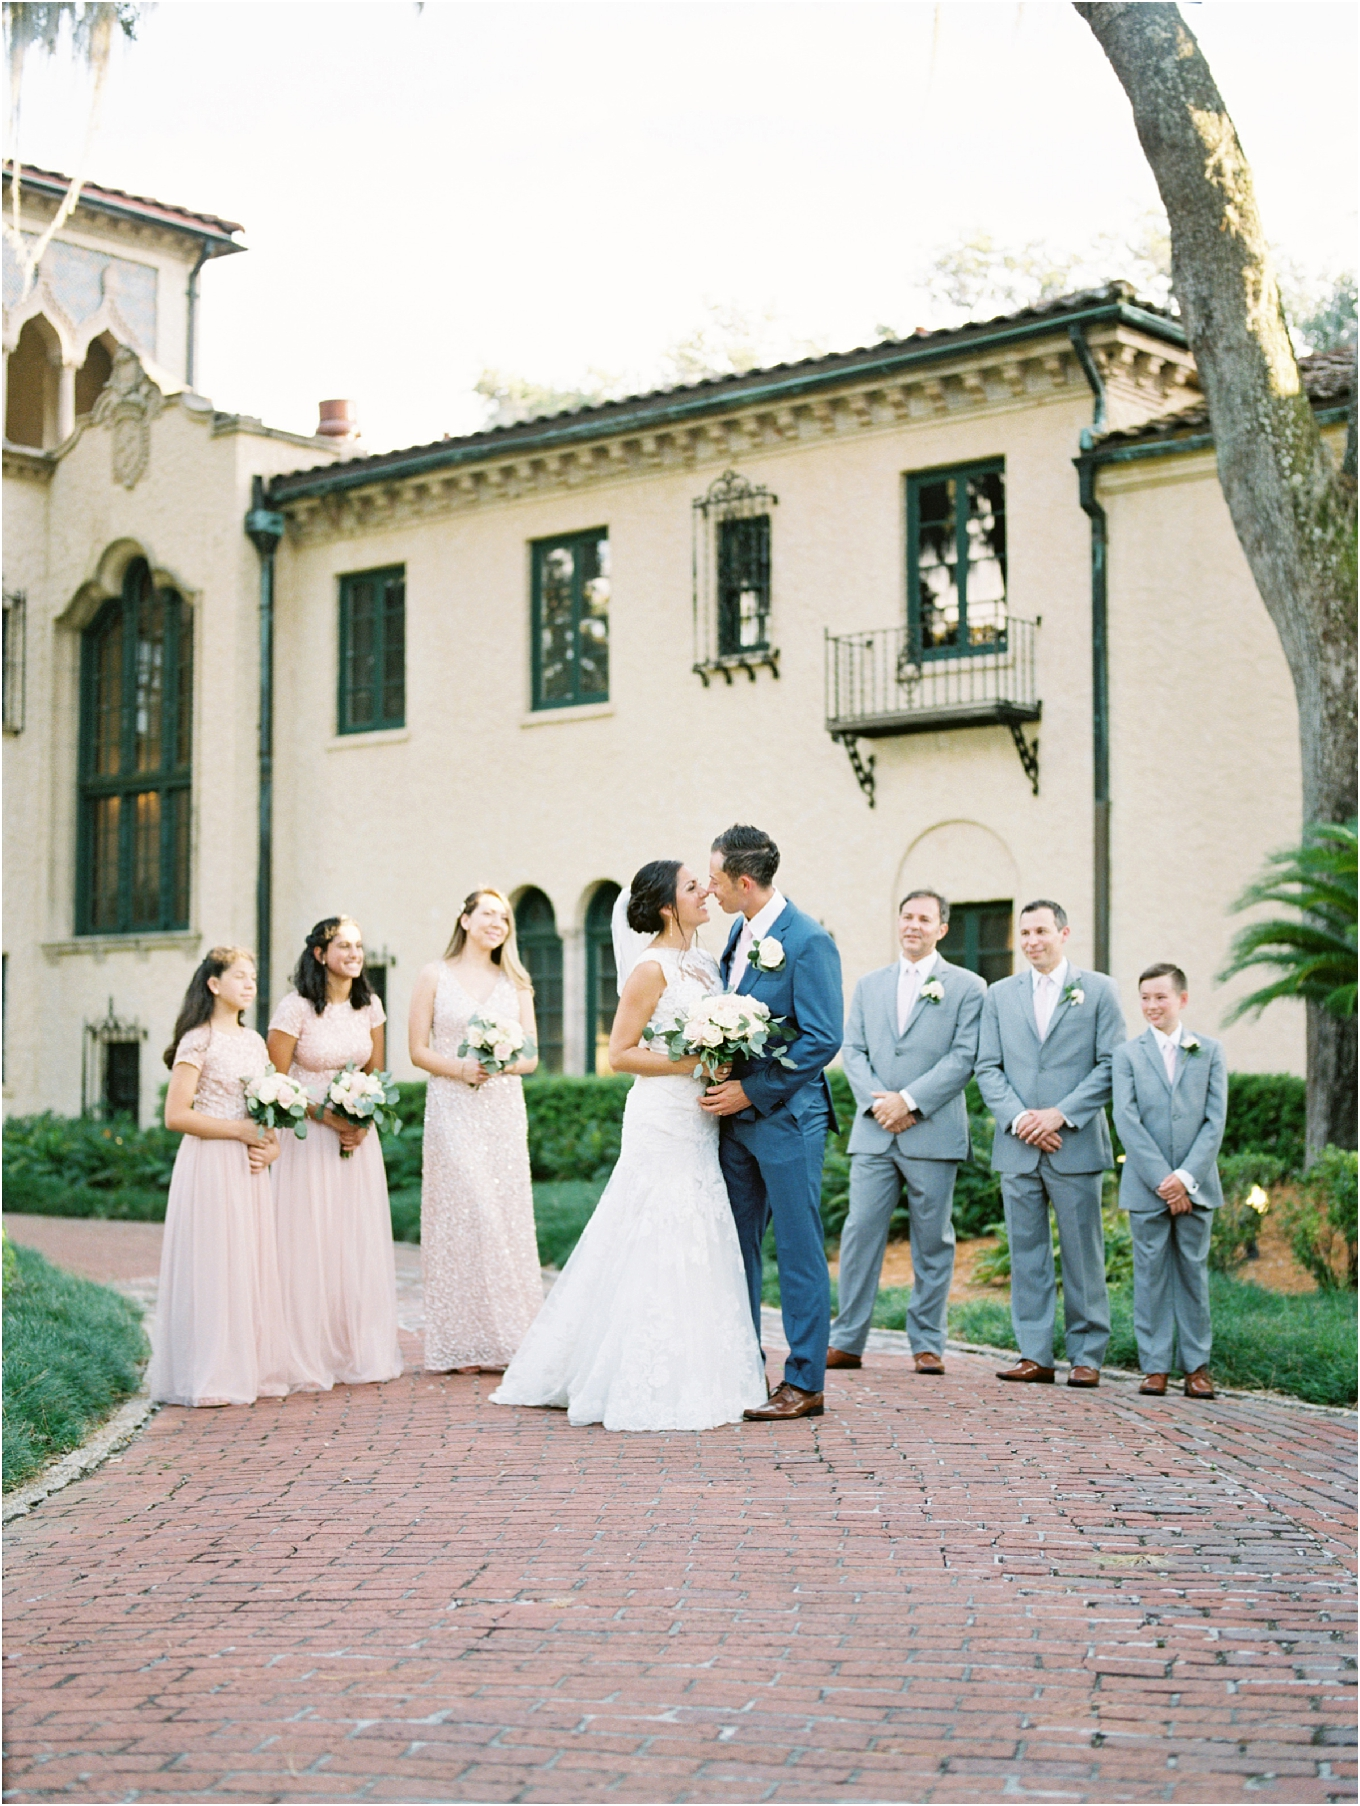 Lisa Silva Photography- Ponte Vedra Beach, St. Augustine and Jacksonville, Florida Fine Art Film Wedding and Boudoir Photography- Elegant Blush  Wedding at Epping Forest Yacht Club in Jacksonville, Florida_0066.jpg